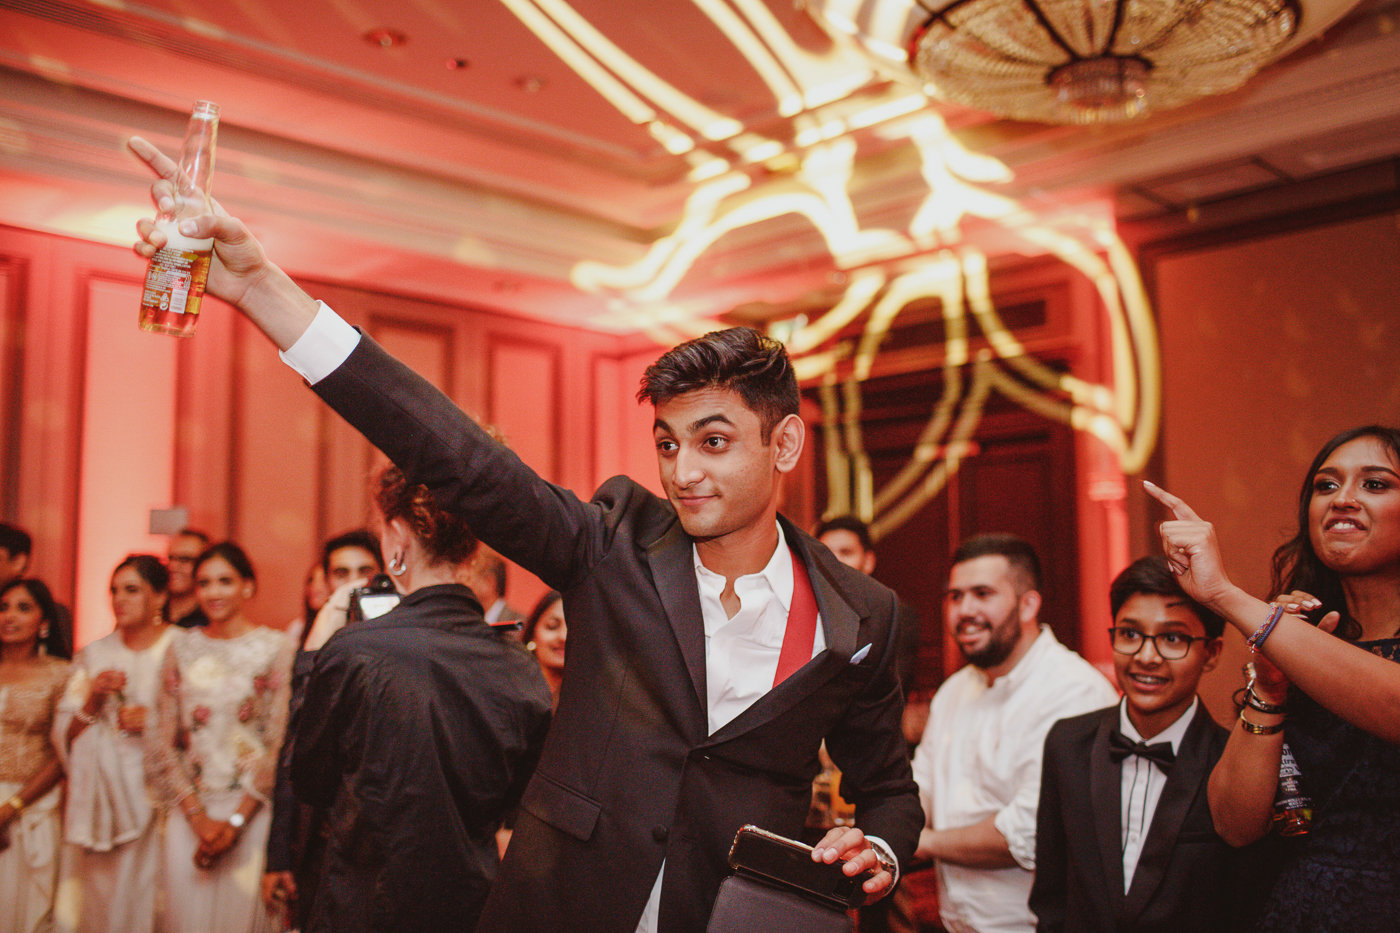 rosewood-hotel-wedding-photographer-29.jpg